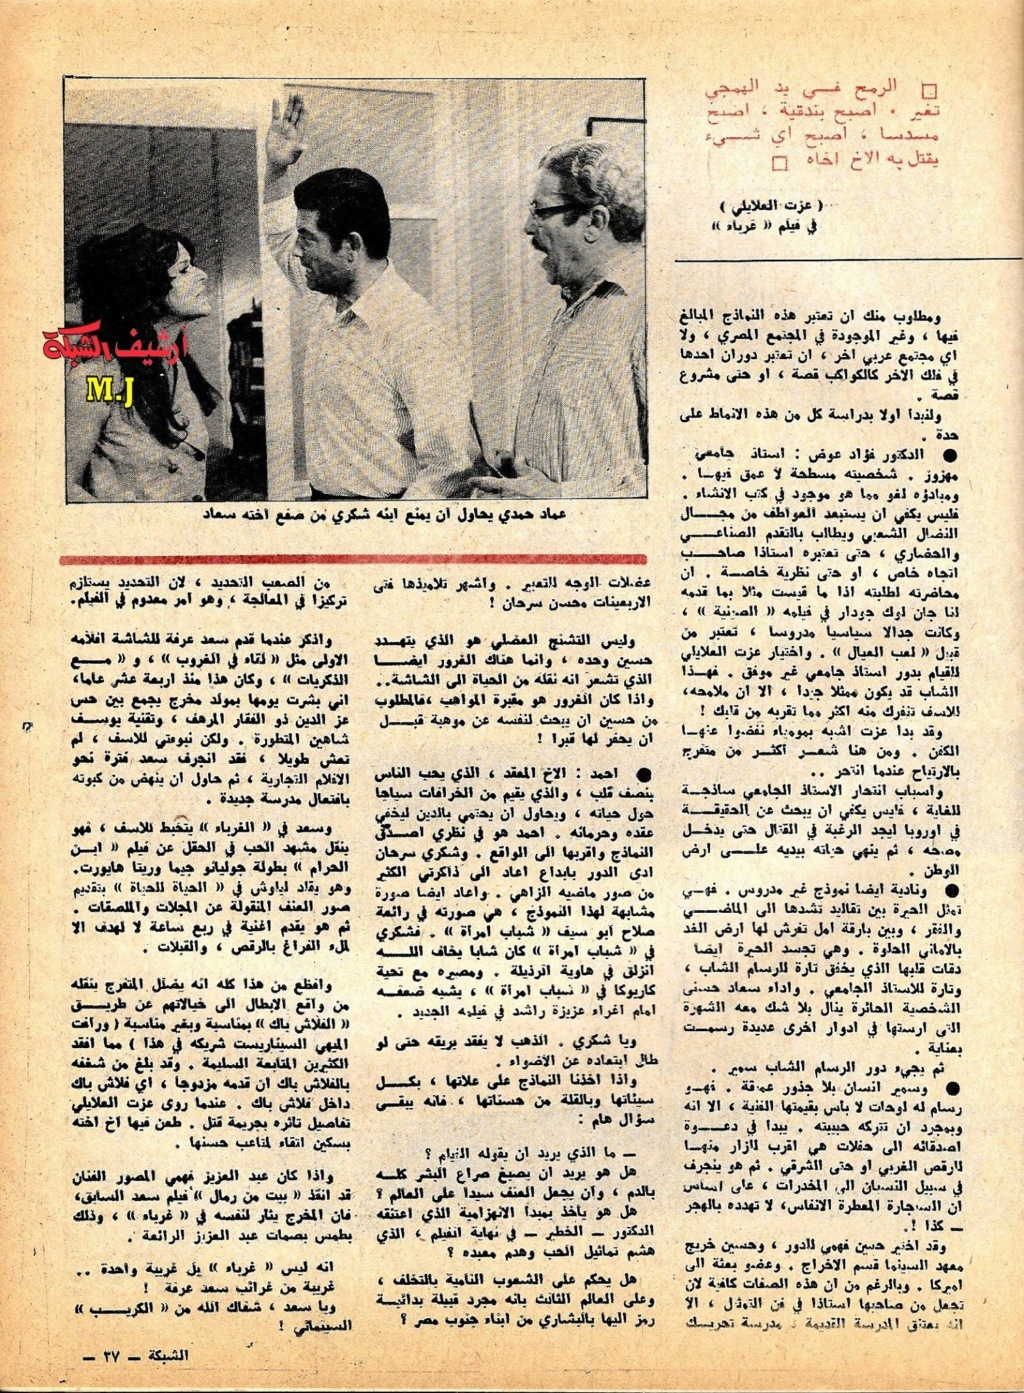 نقد صحفي : غريبة ... وليس غرباء ! 1973 م 2380